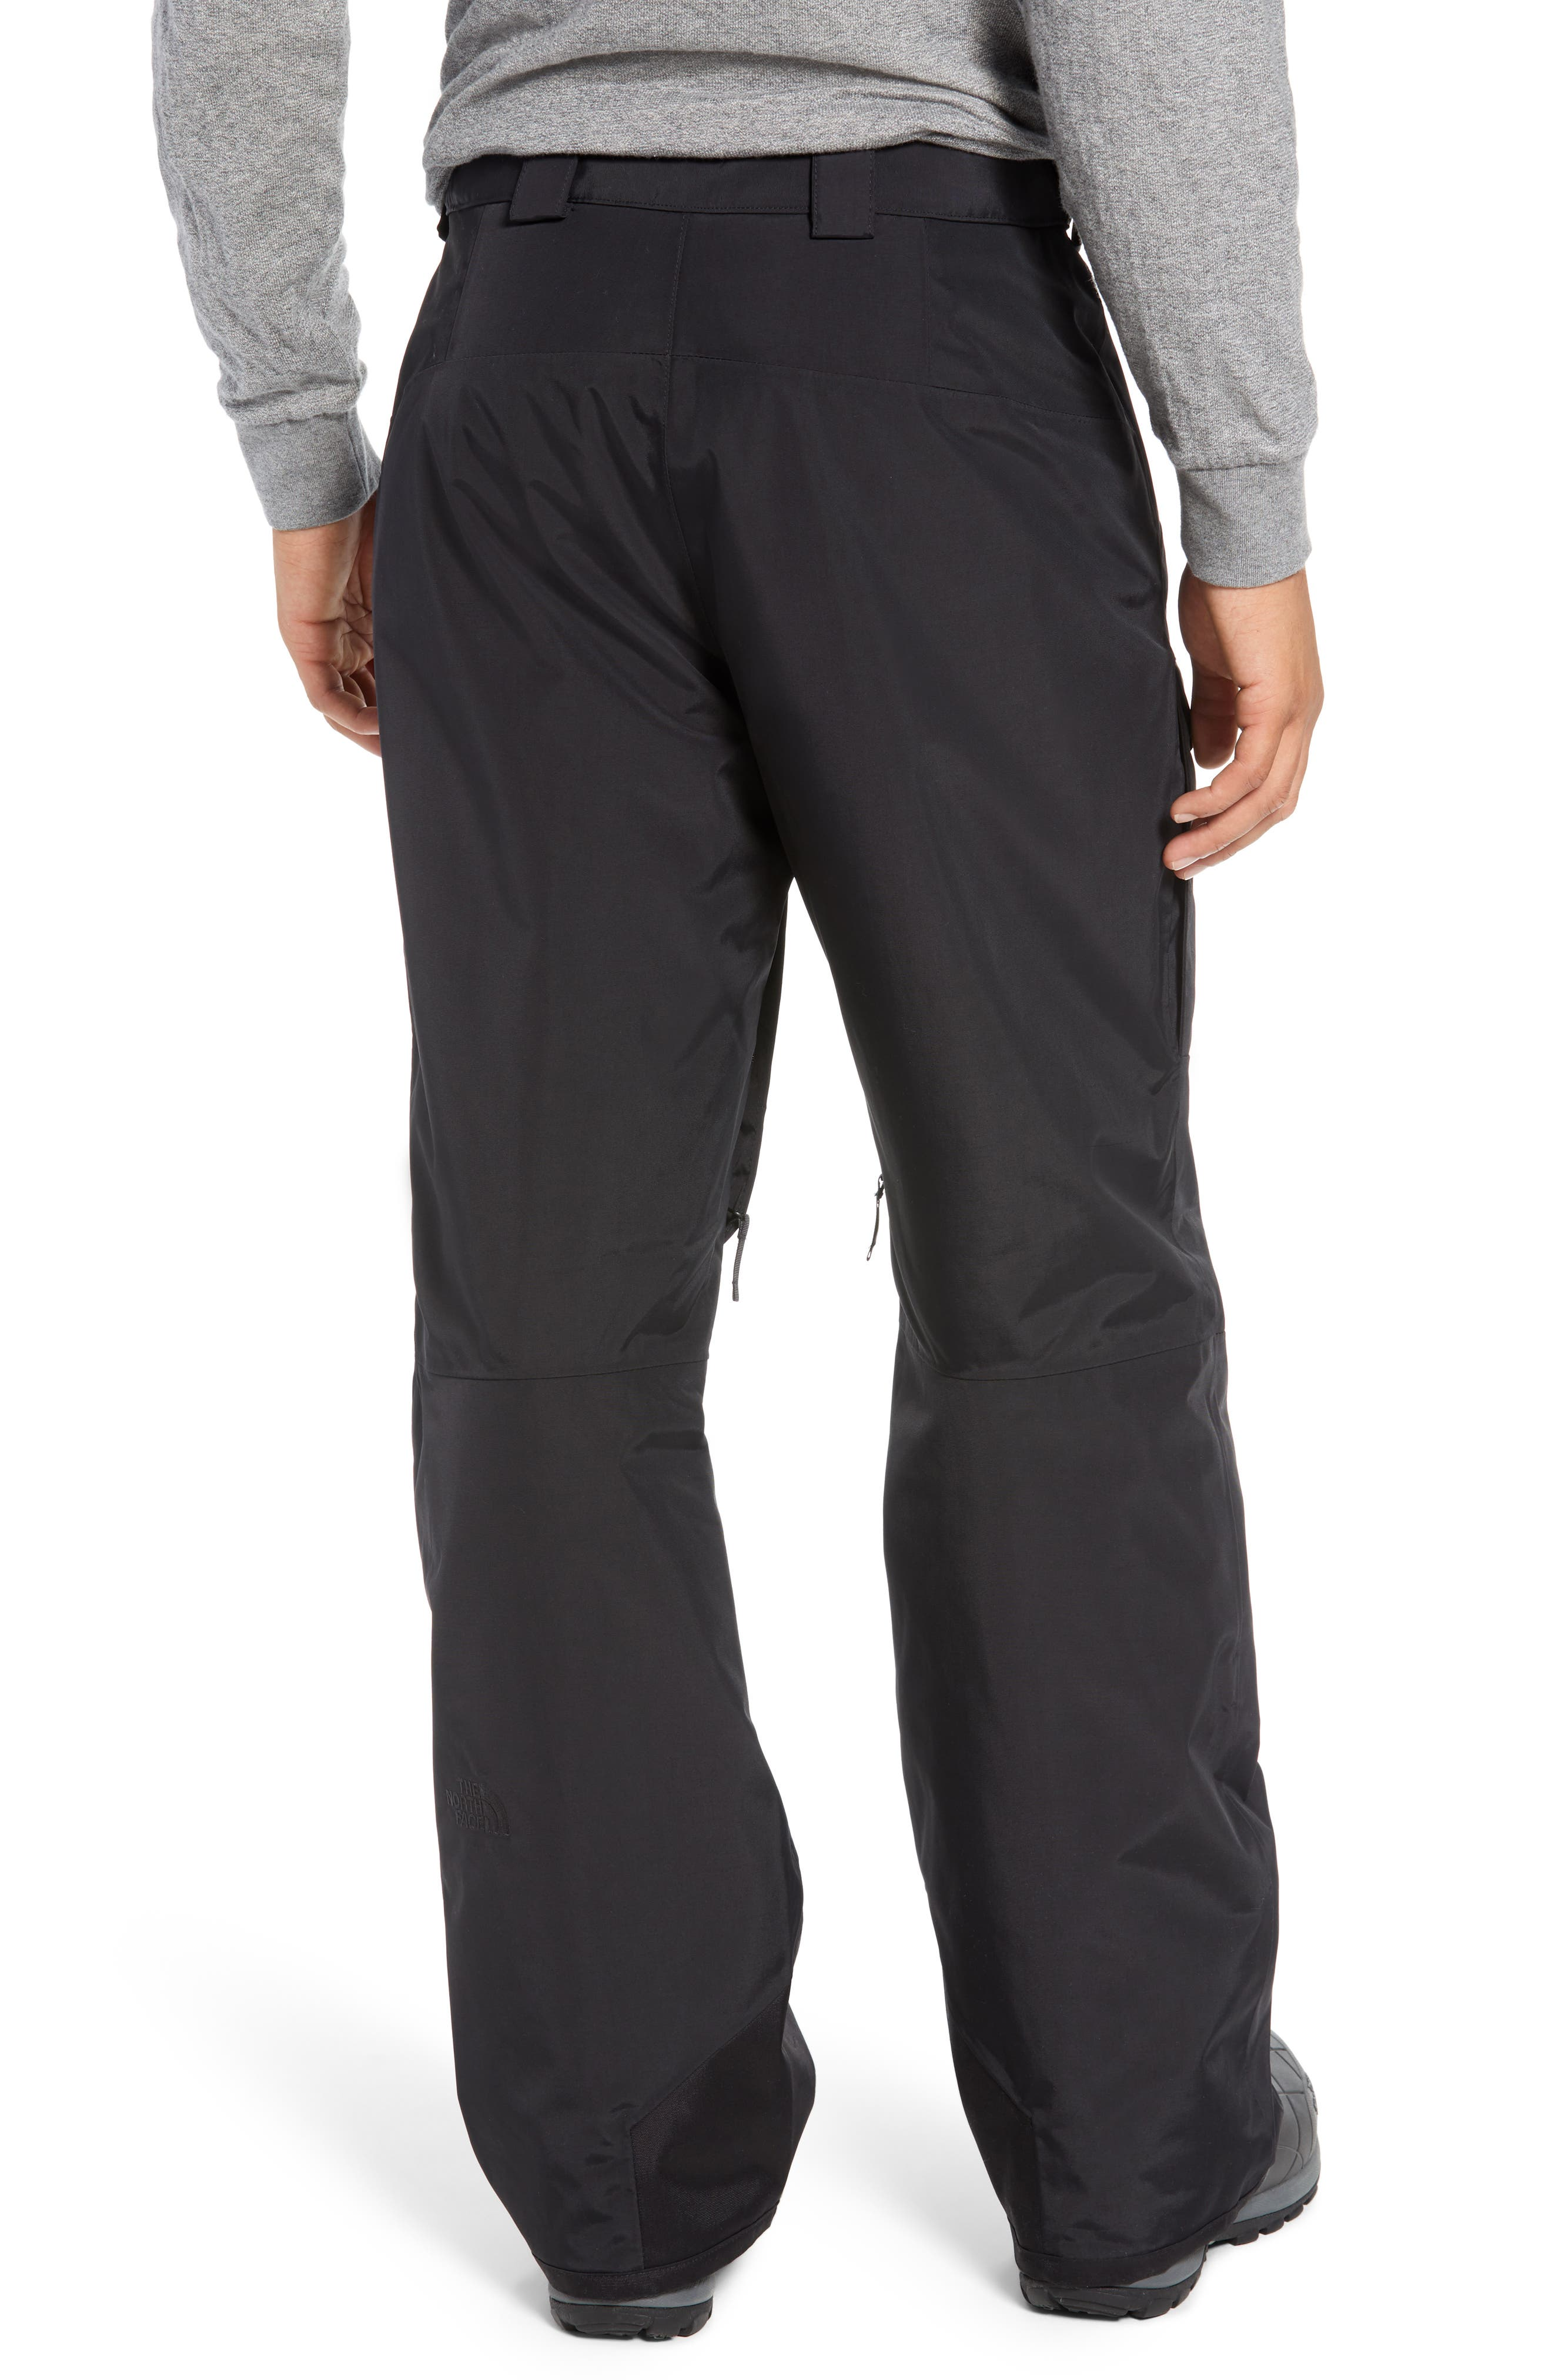 Freedom Heatseeker Insulated Snow Pants,                             Alternate thumbnail 2, color,                             TNF BLACK